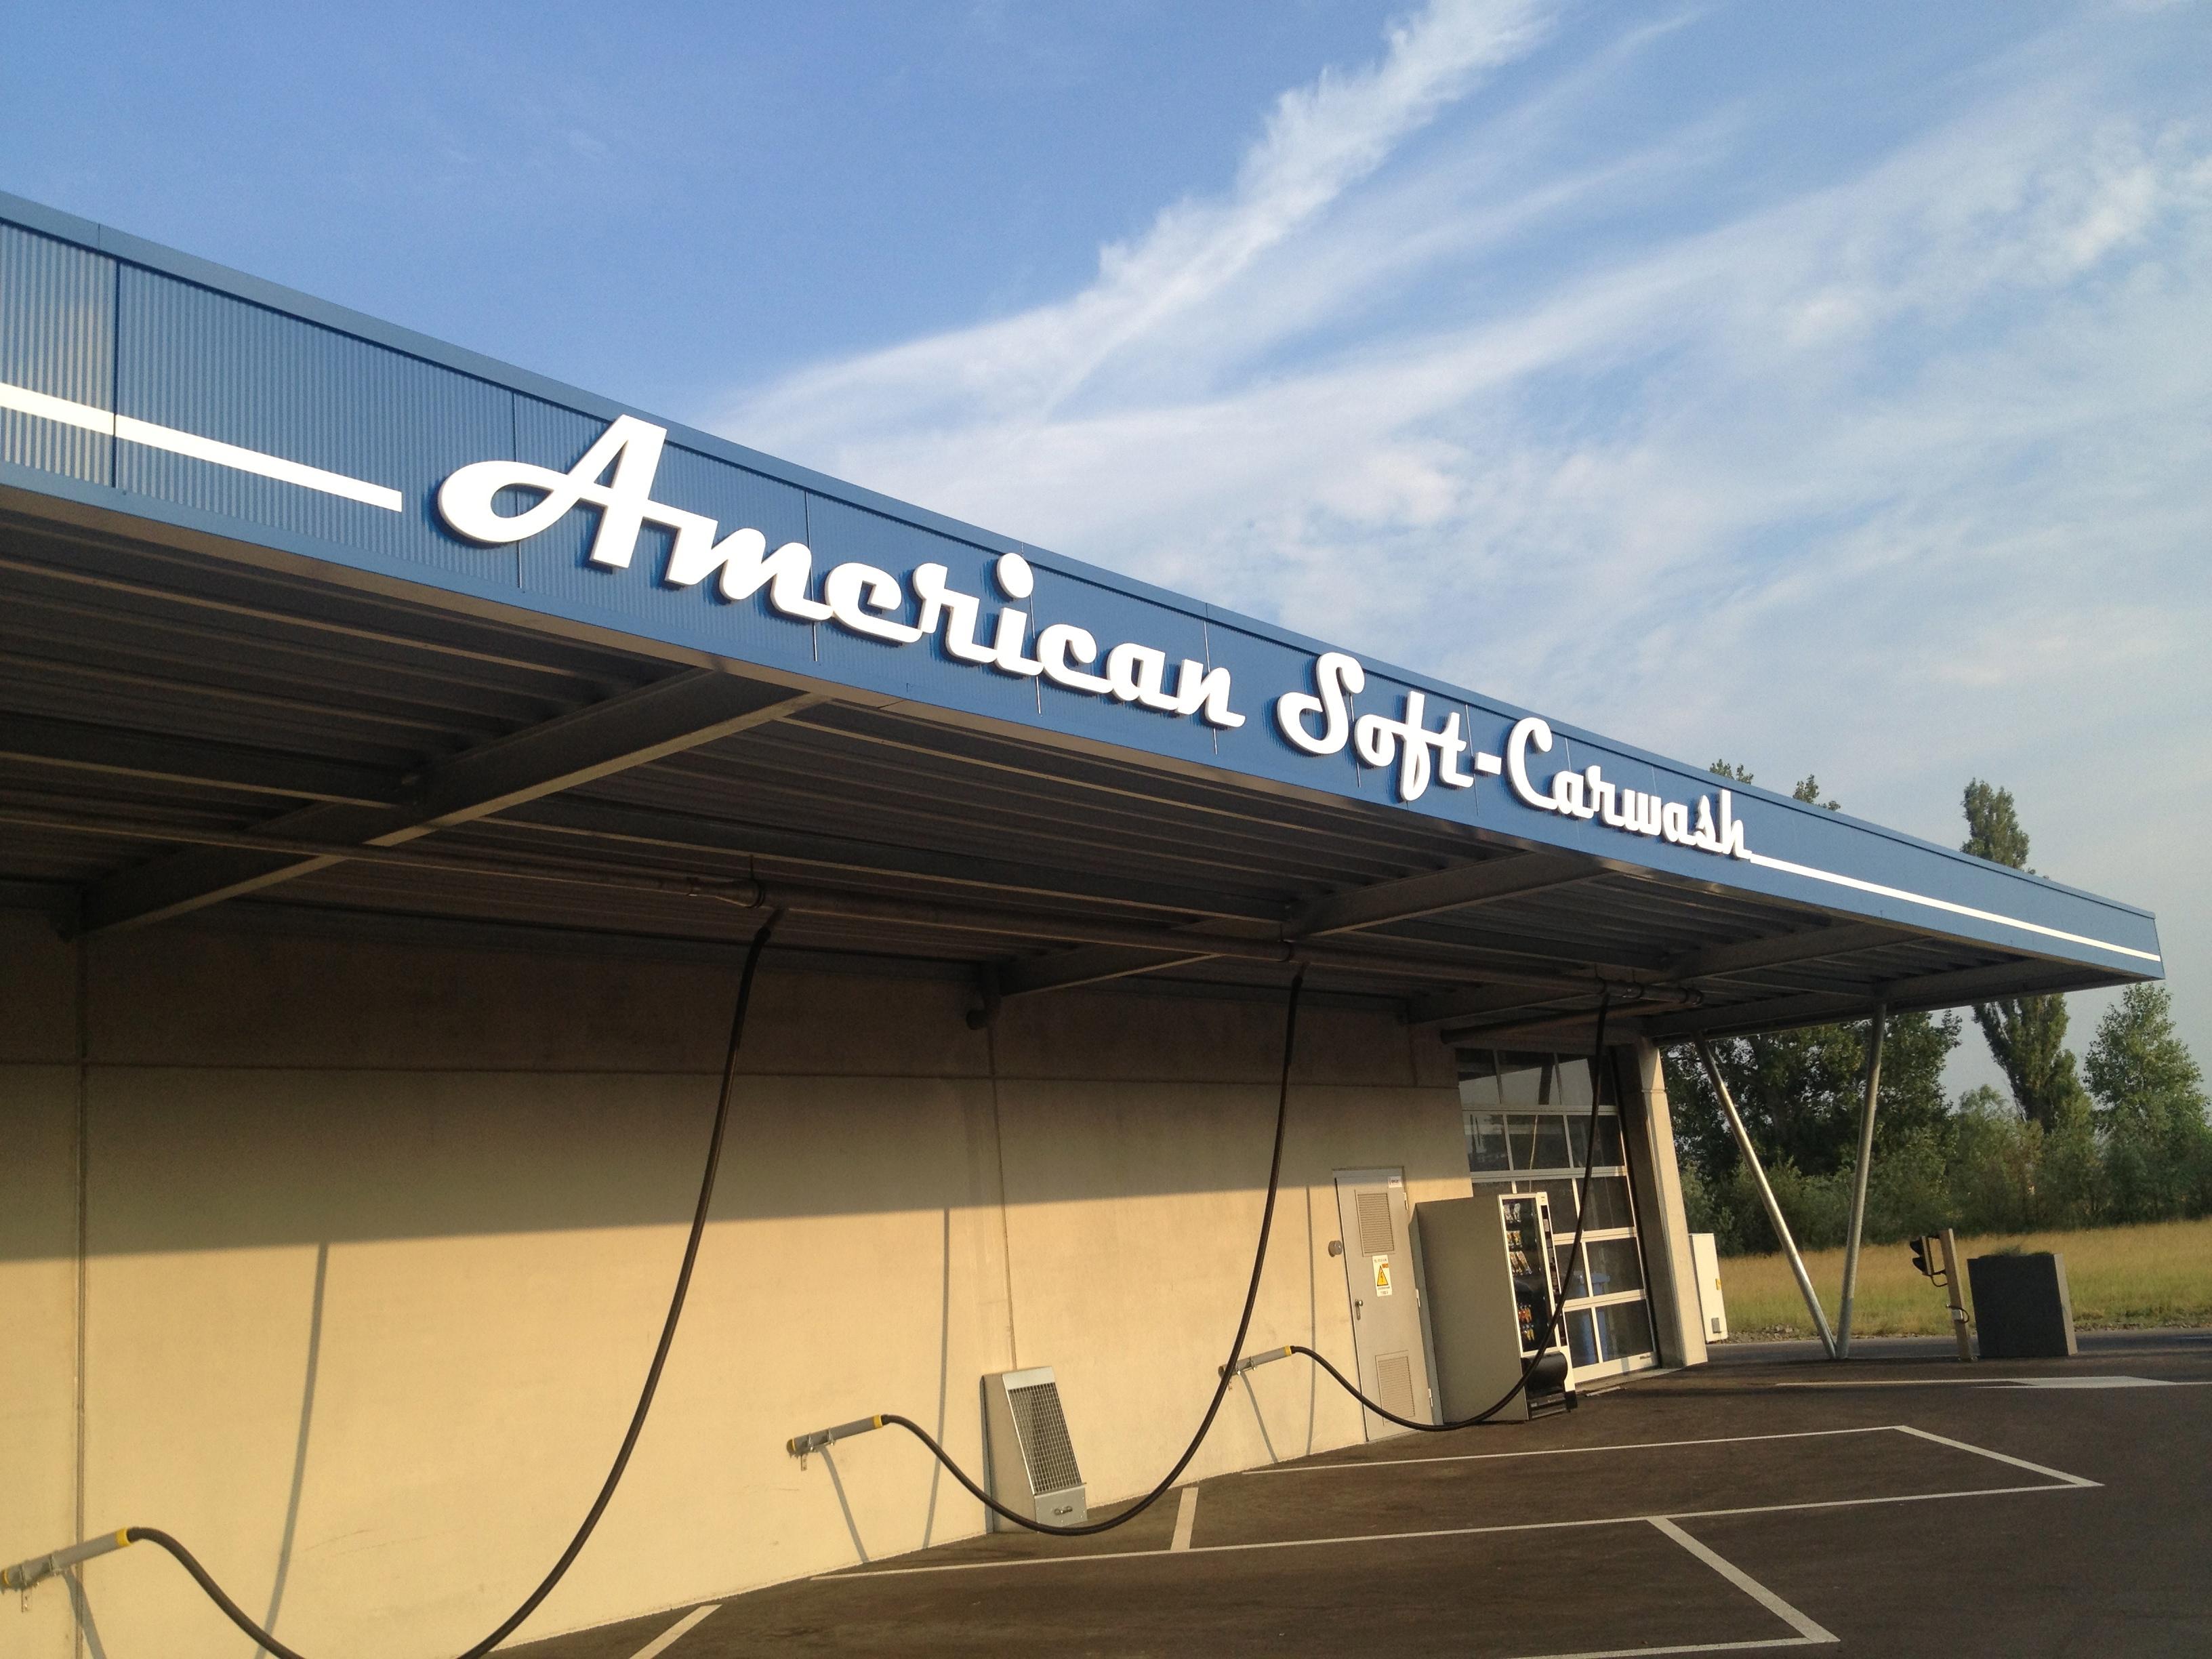 3D letters Amercian soft carwash